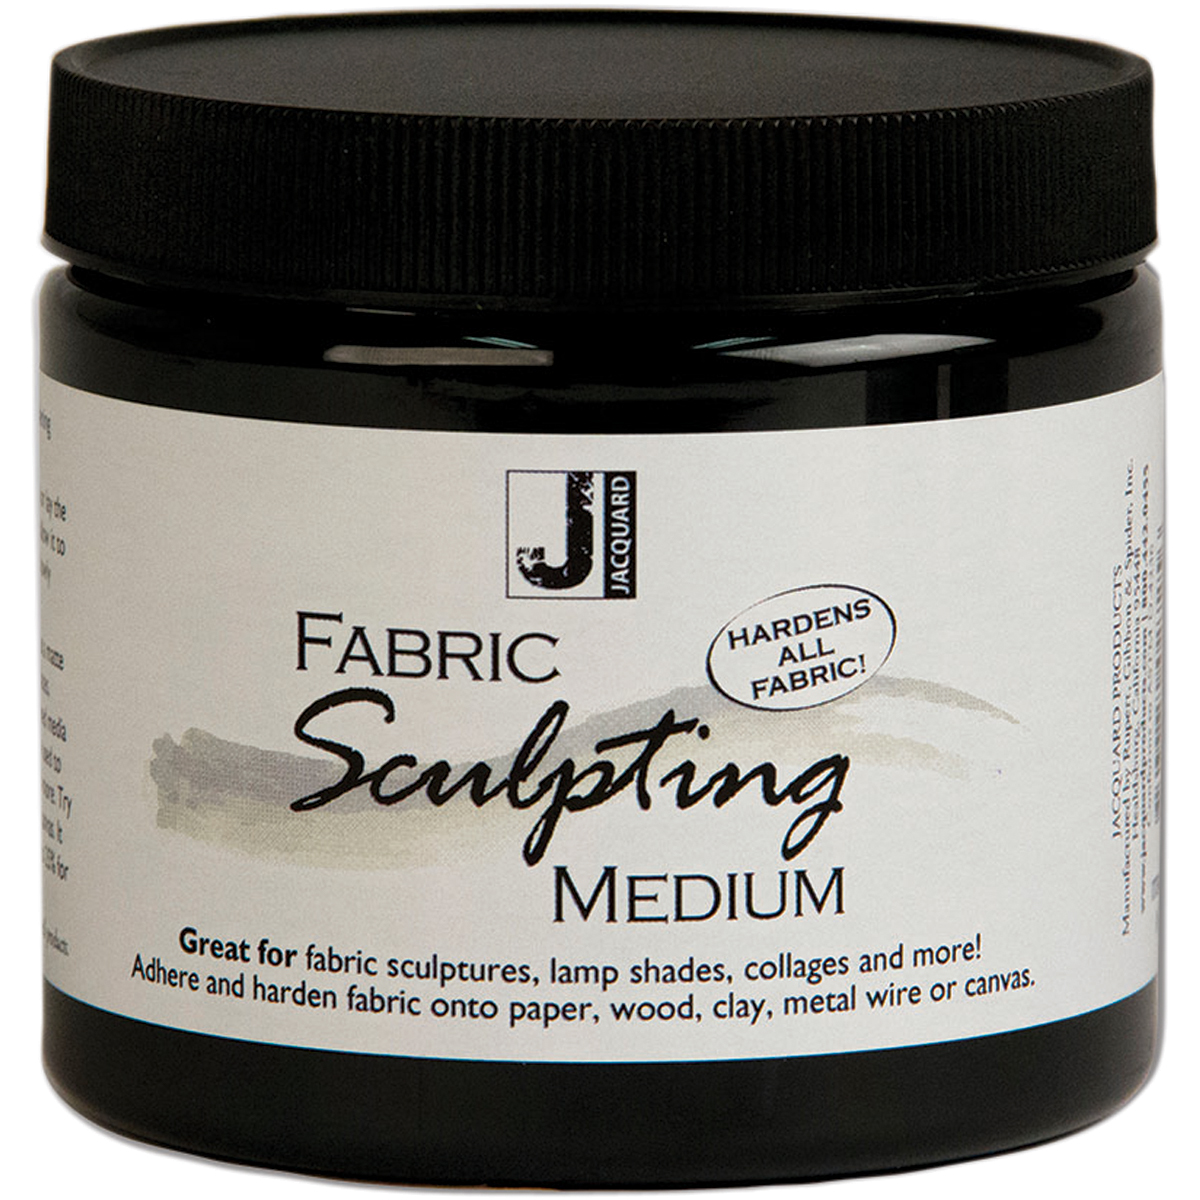 Jacquard Fabric Sculpting Medium 16oz-